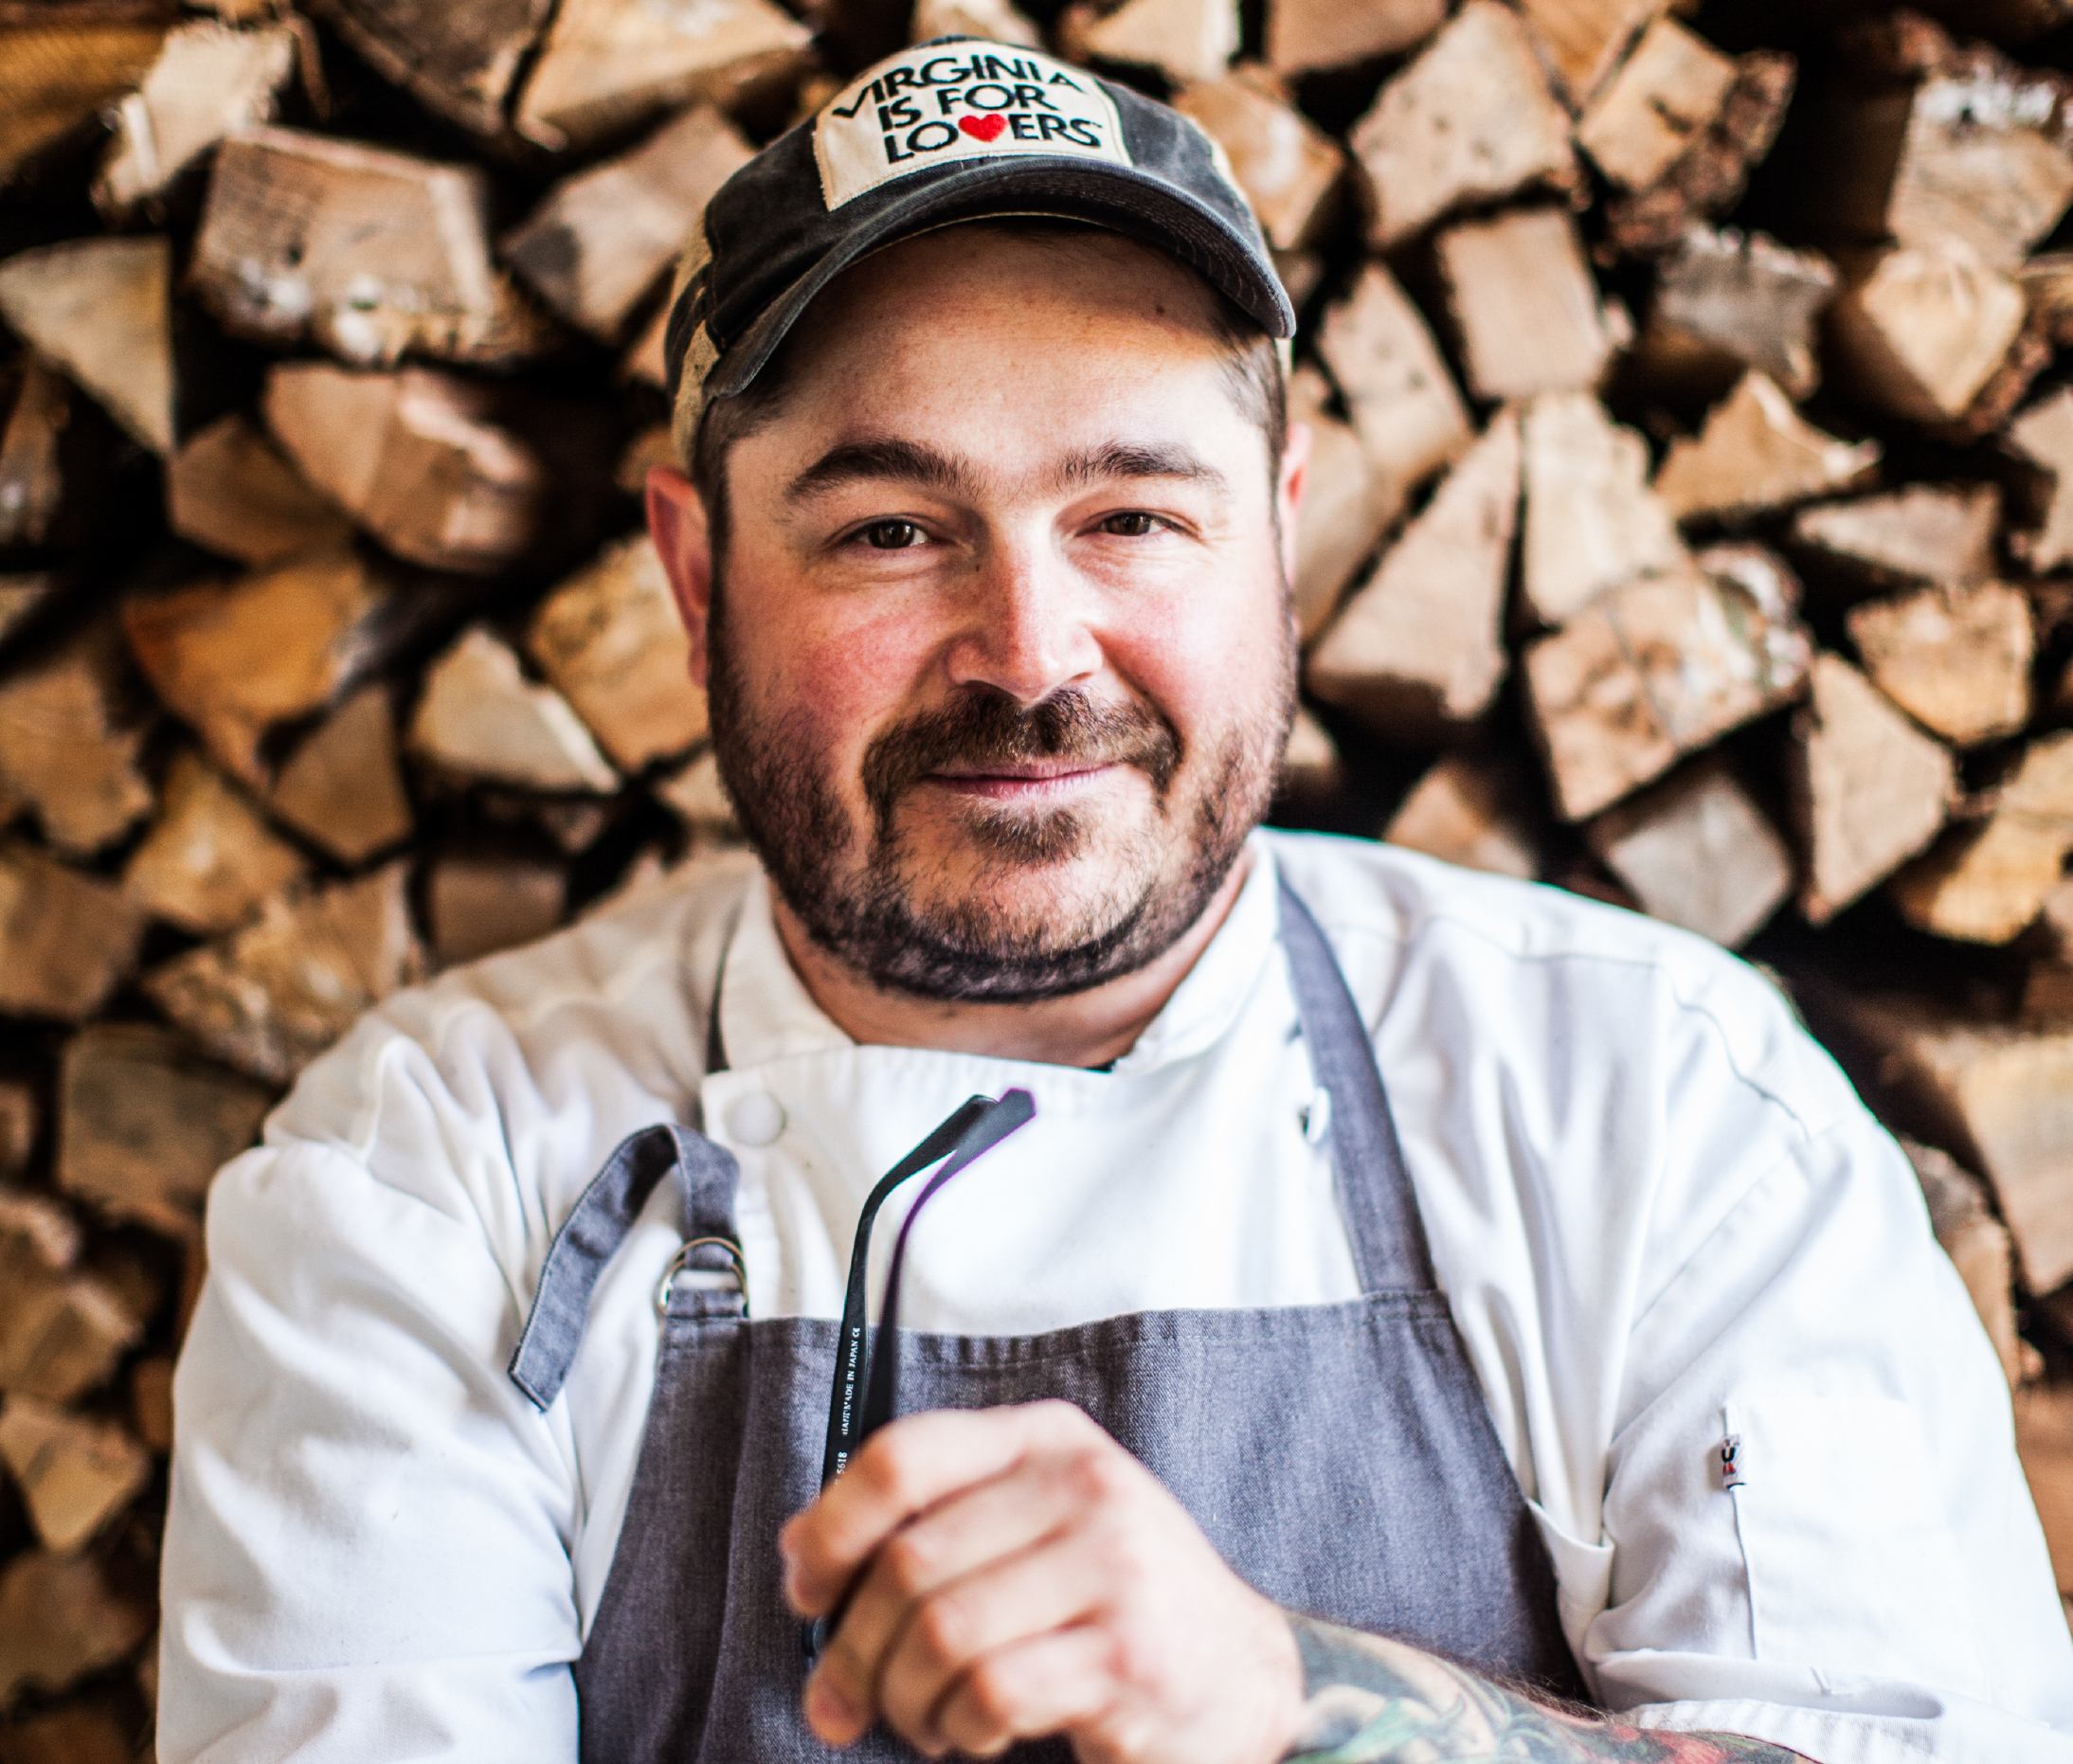 Sean Brock holding glasses in apron, wood pile behind